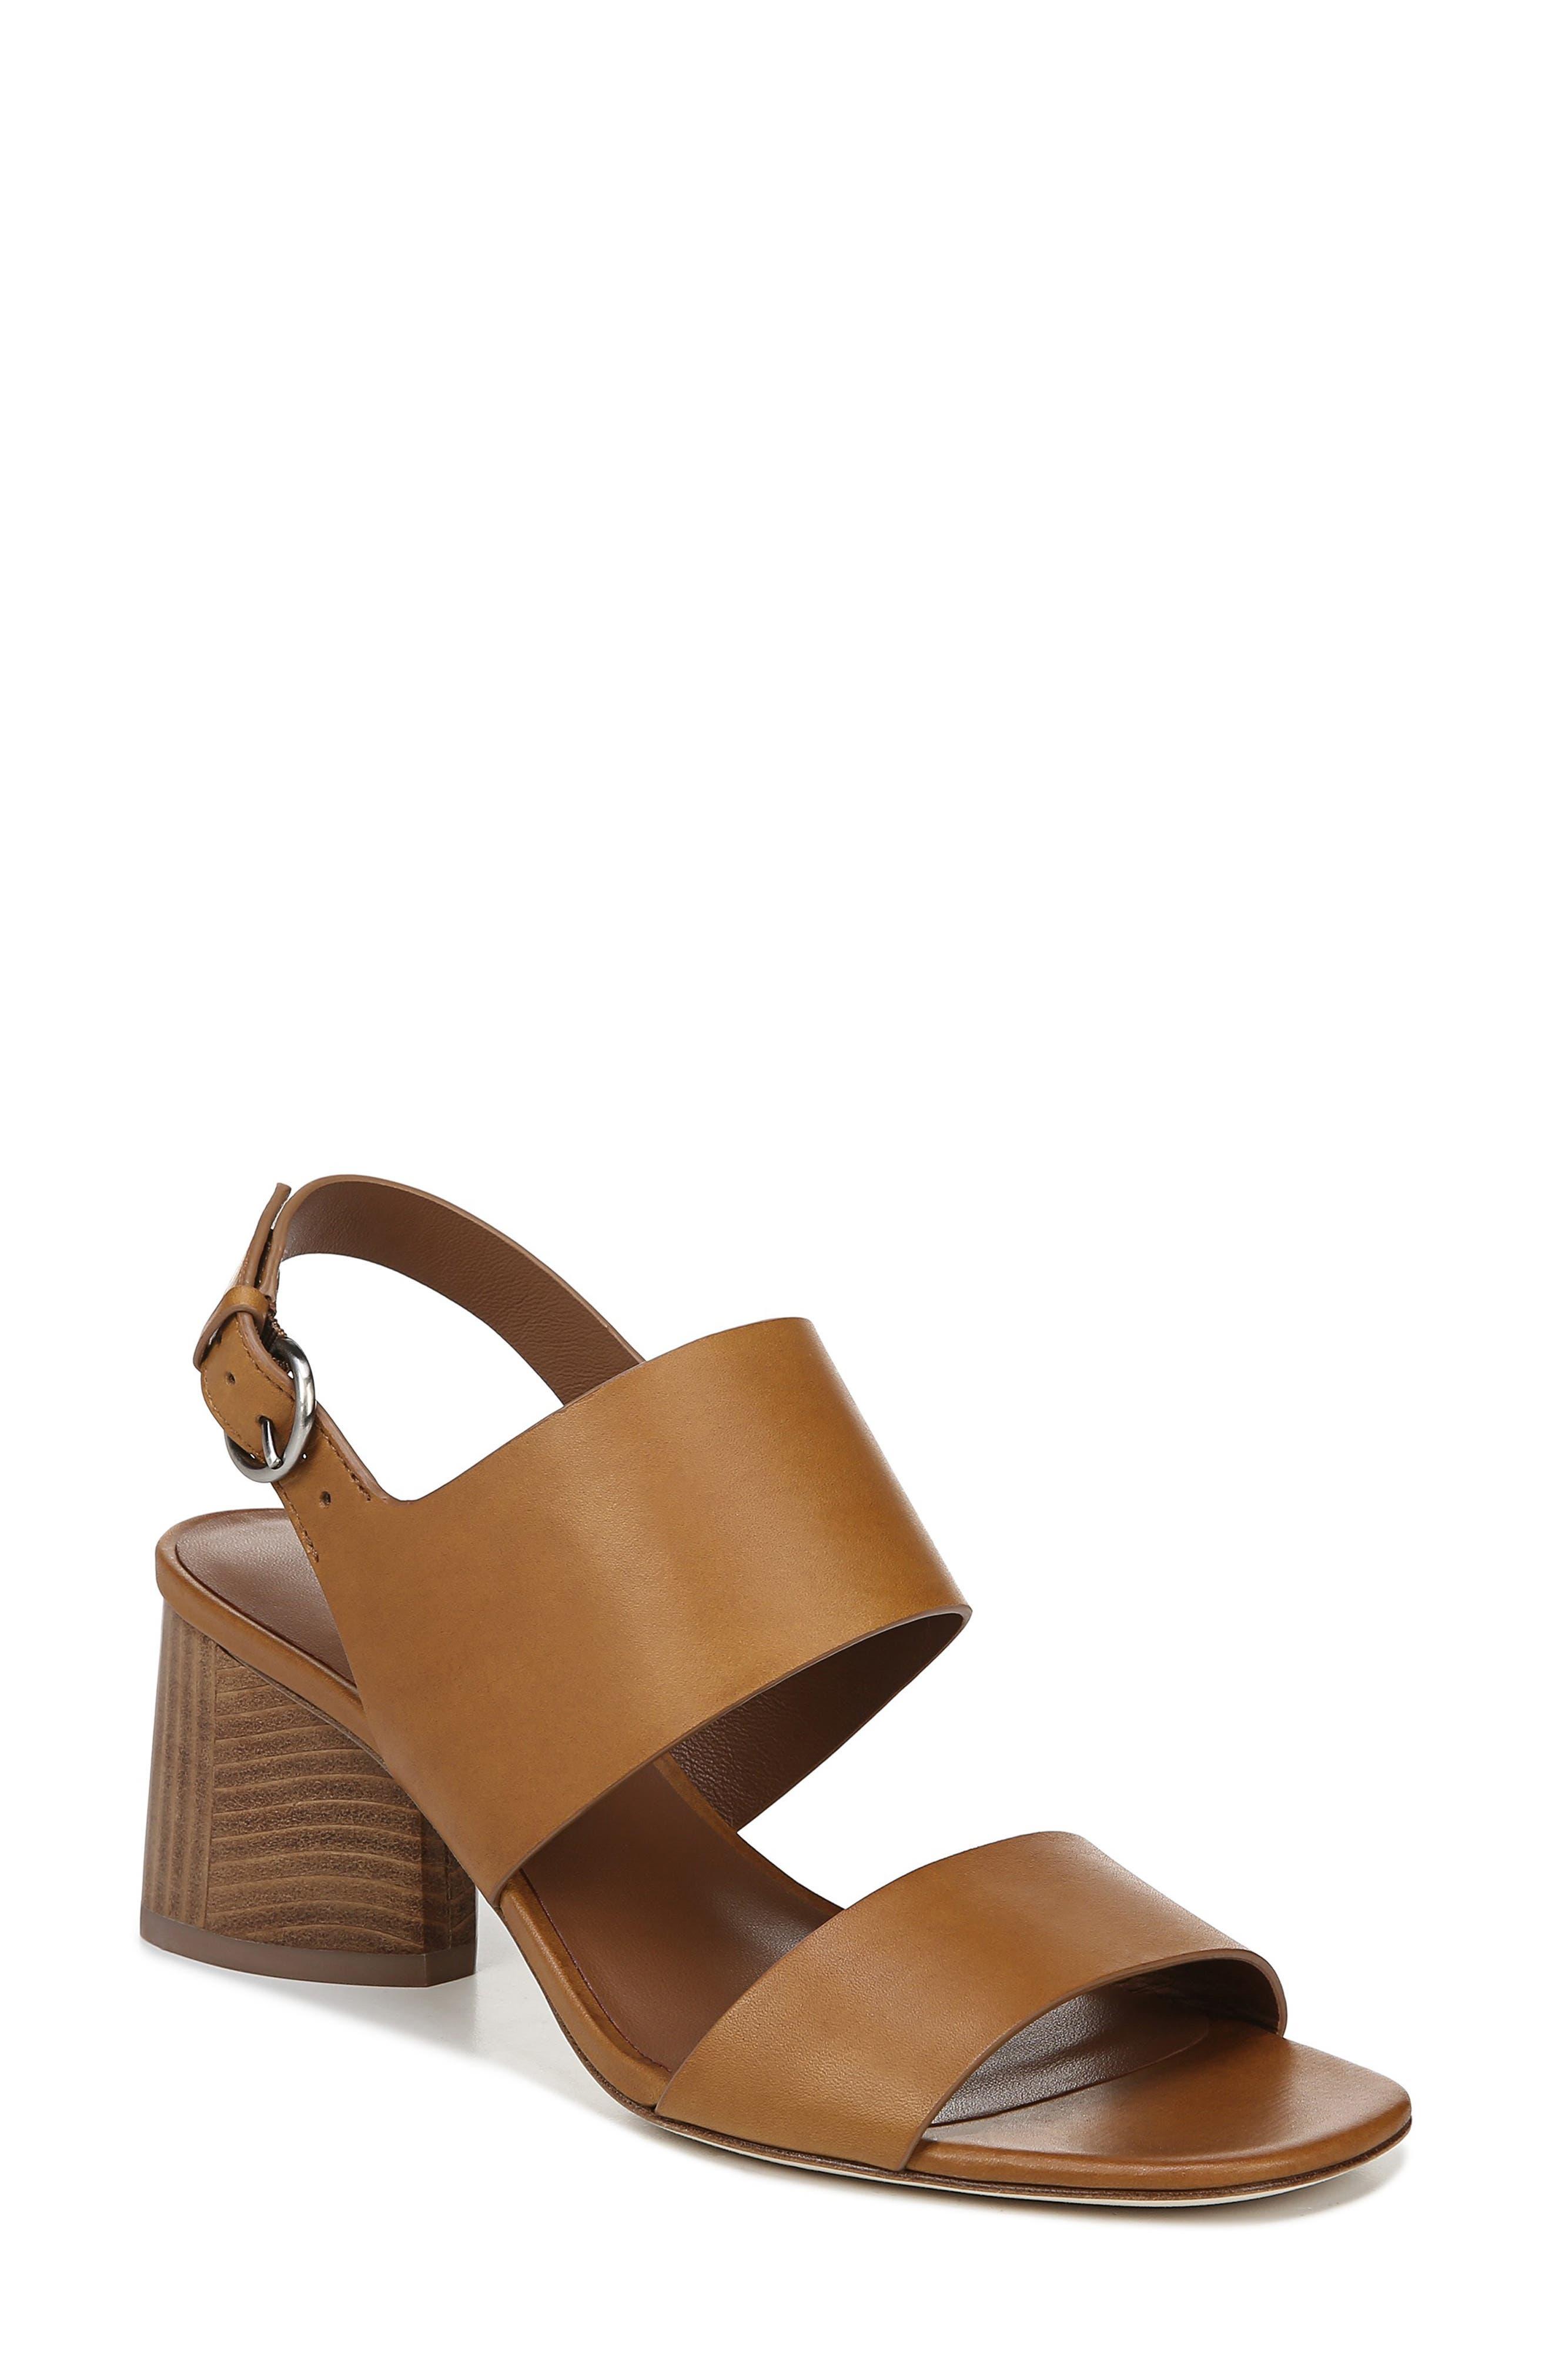 VIA SPIGA Libby Statement Heel Sandal, Main, color, TAN